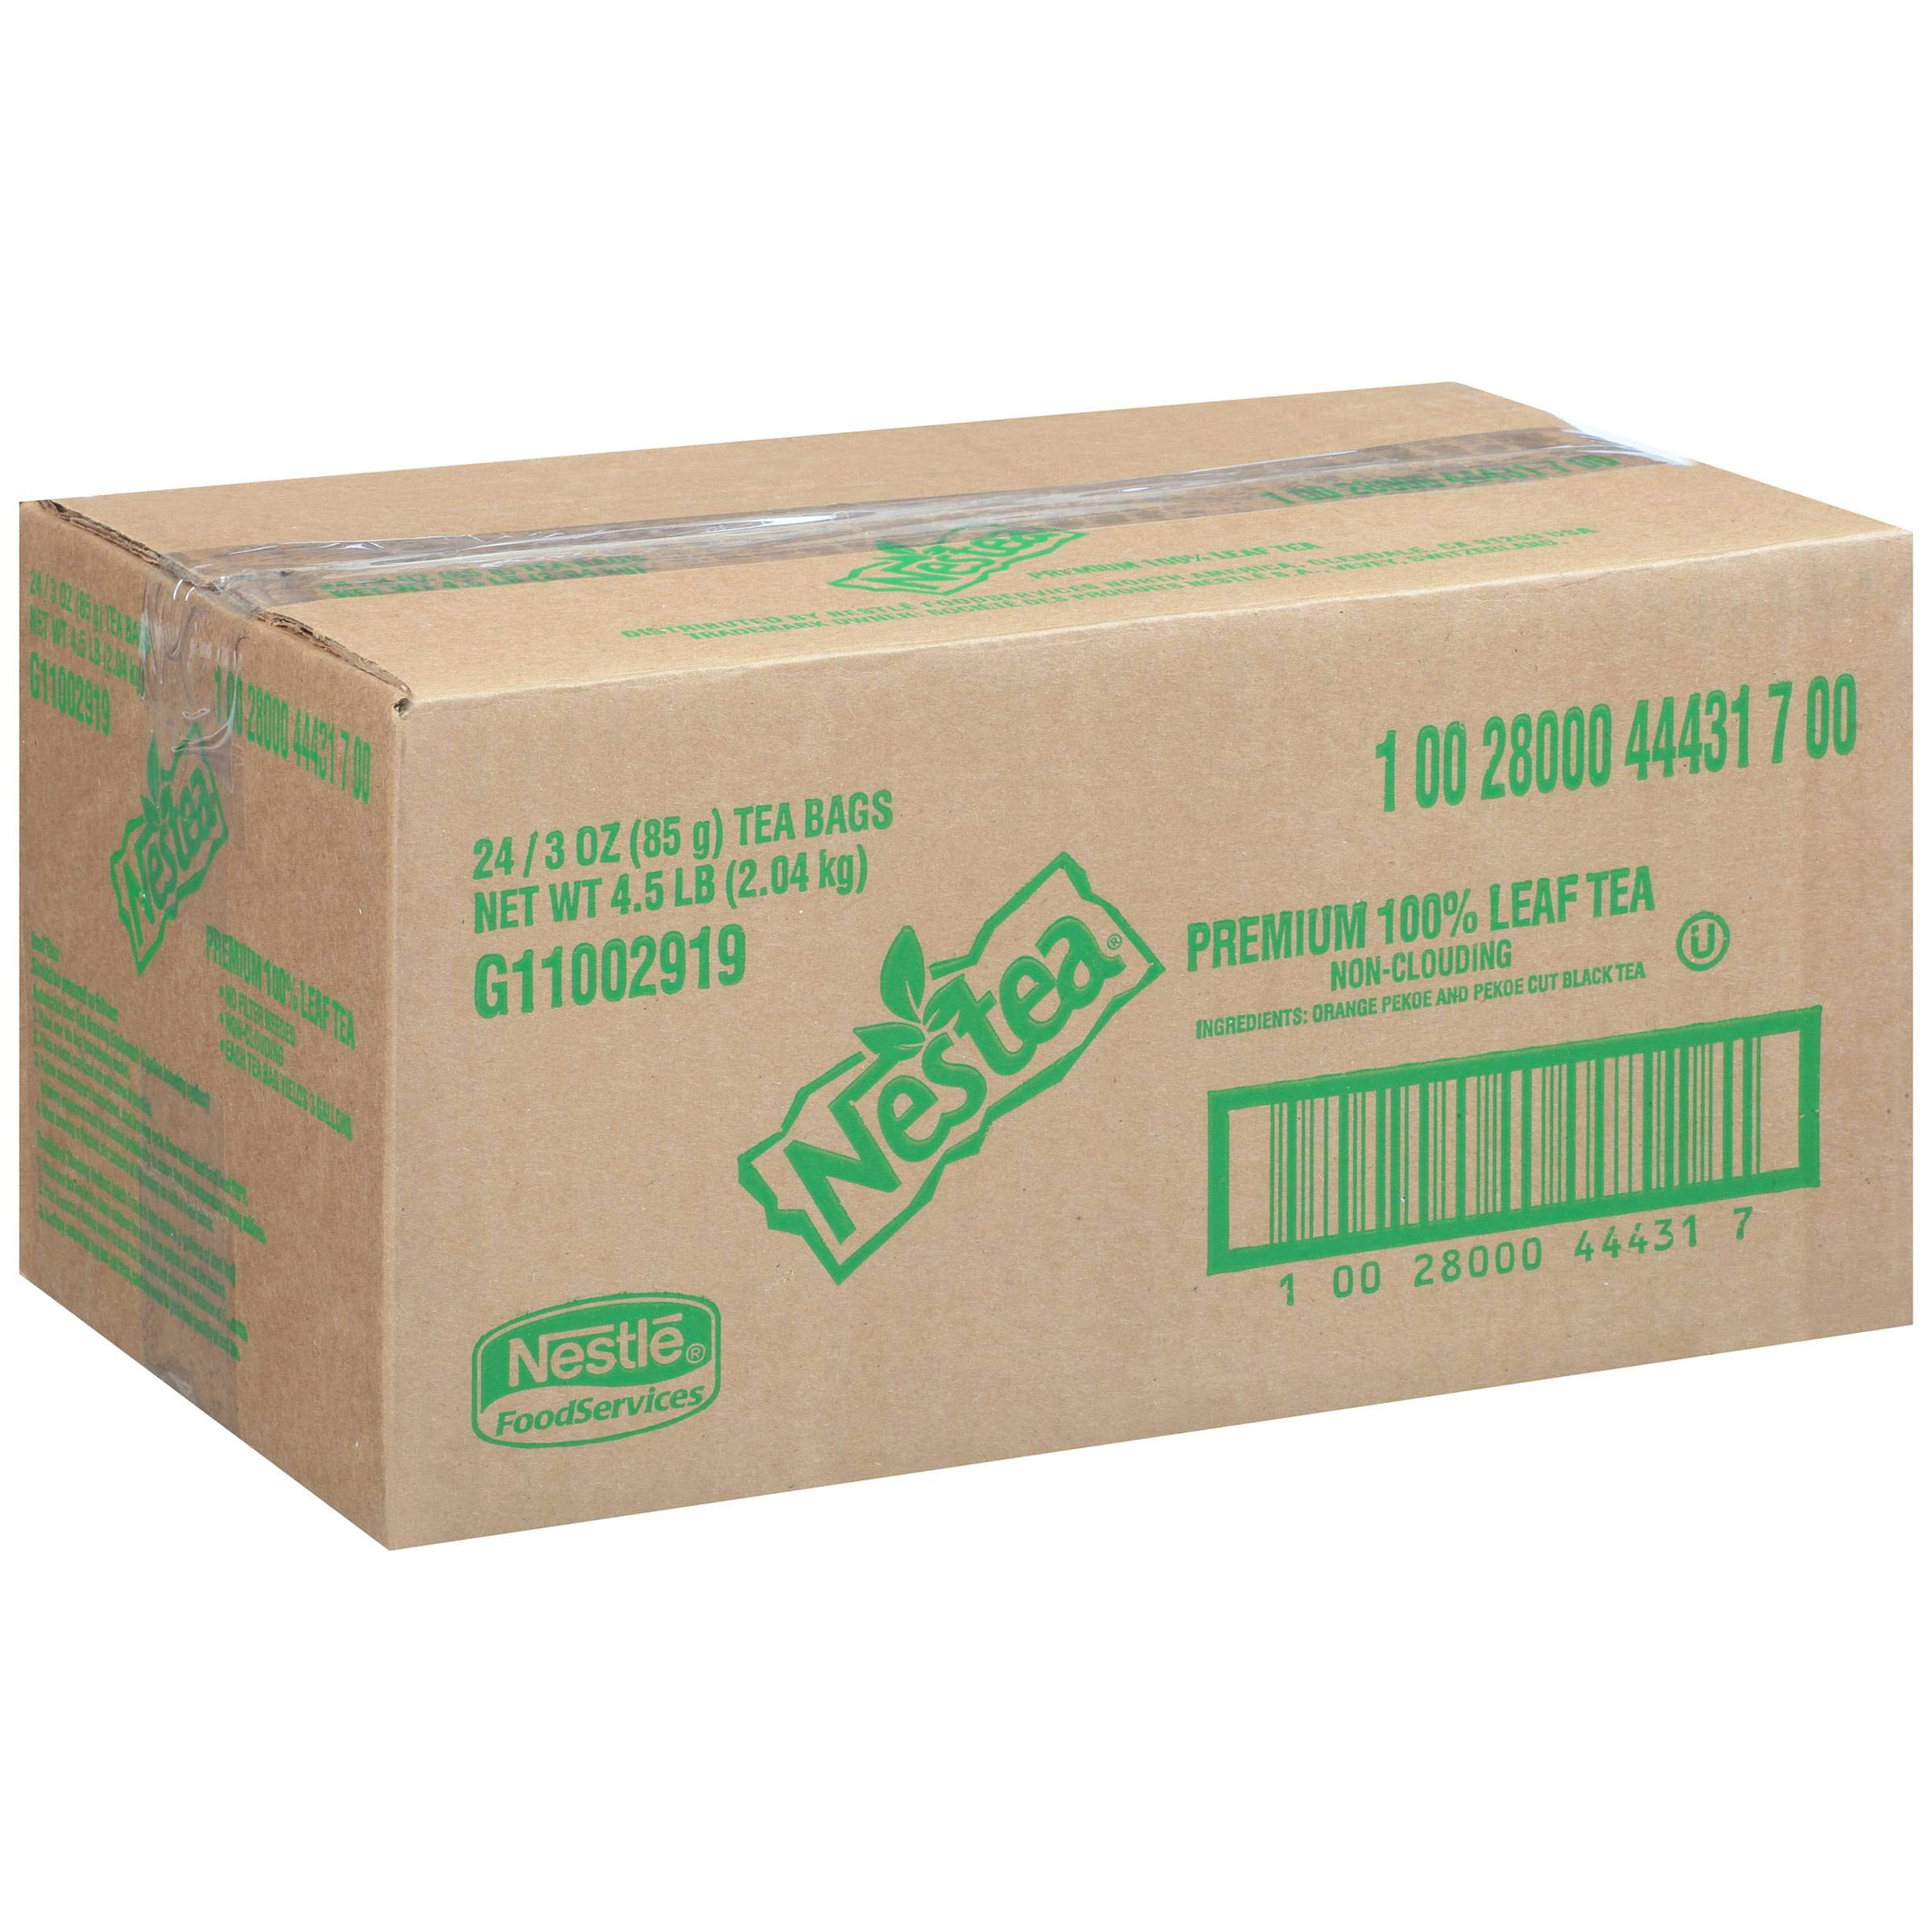 Nestea Premium 100 Percent Leaf Tea - 3 gallon tea bag - 24 per case